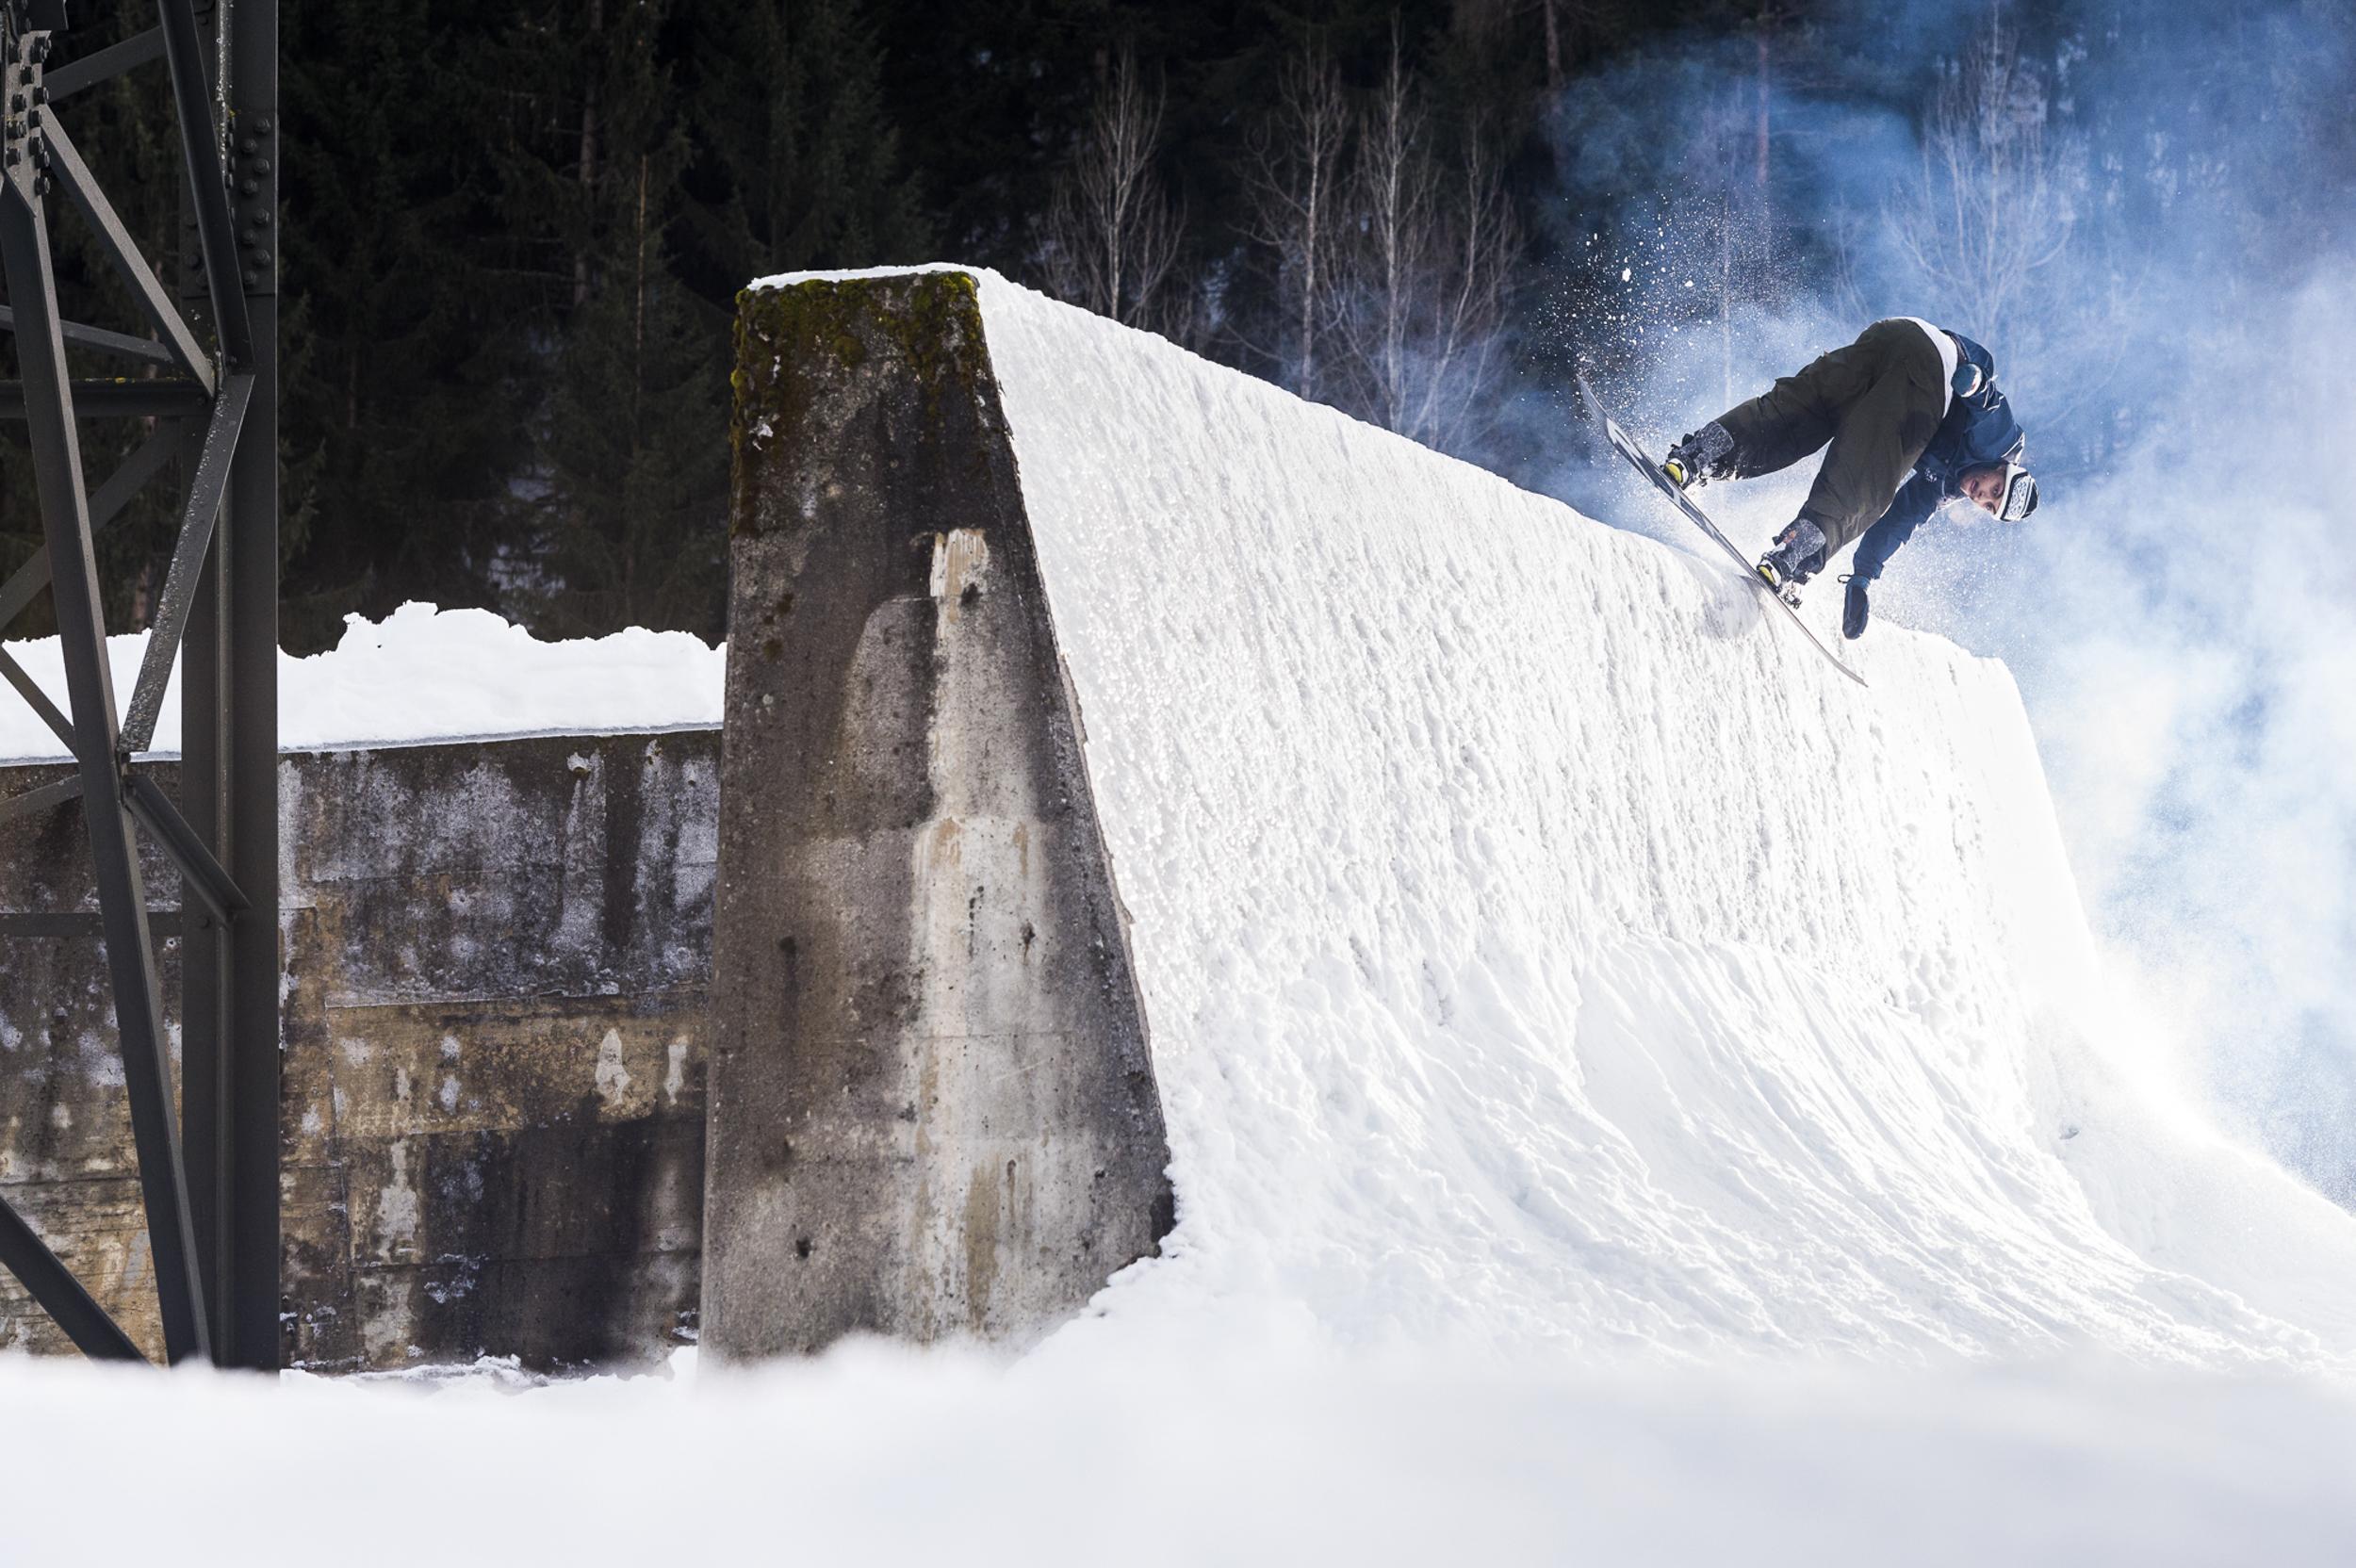 Dillon Ojo Snowboarder